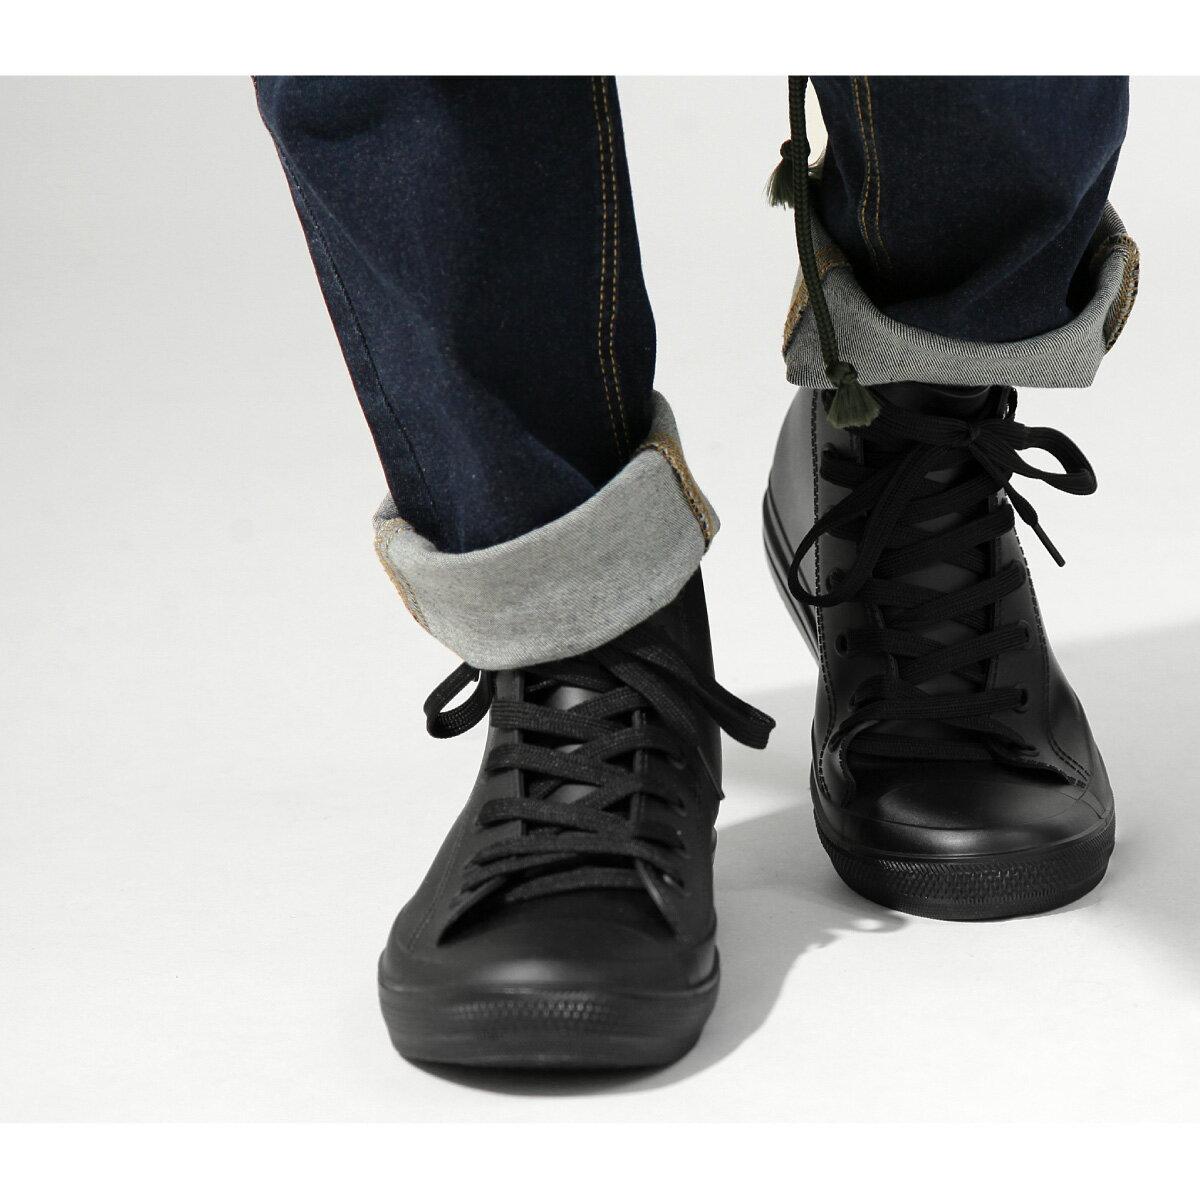 【New】ZIP 長筒 綁鞋帶雨鞋 4